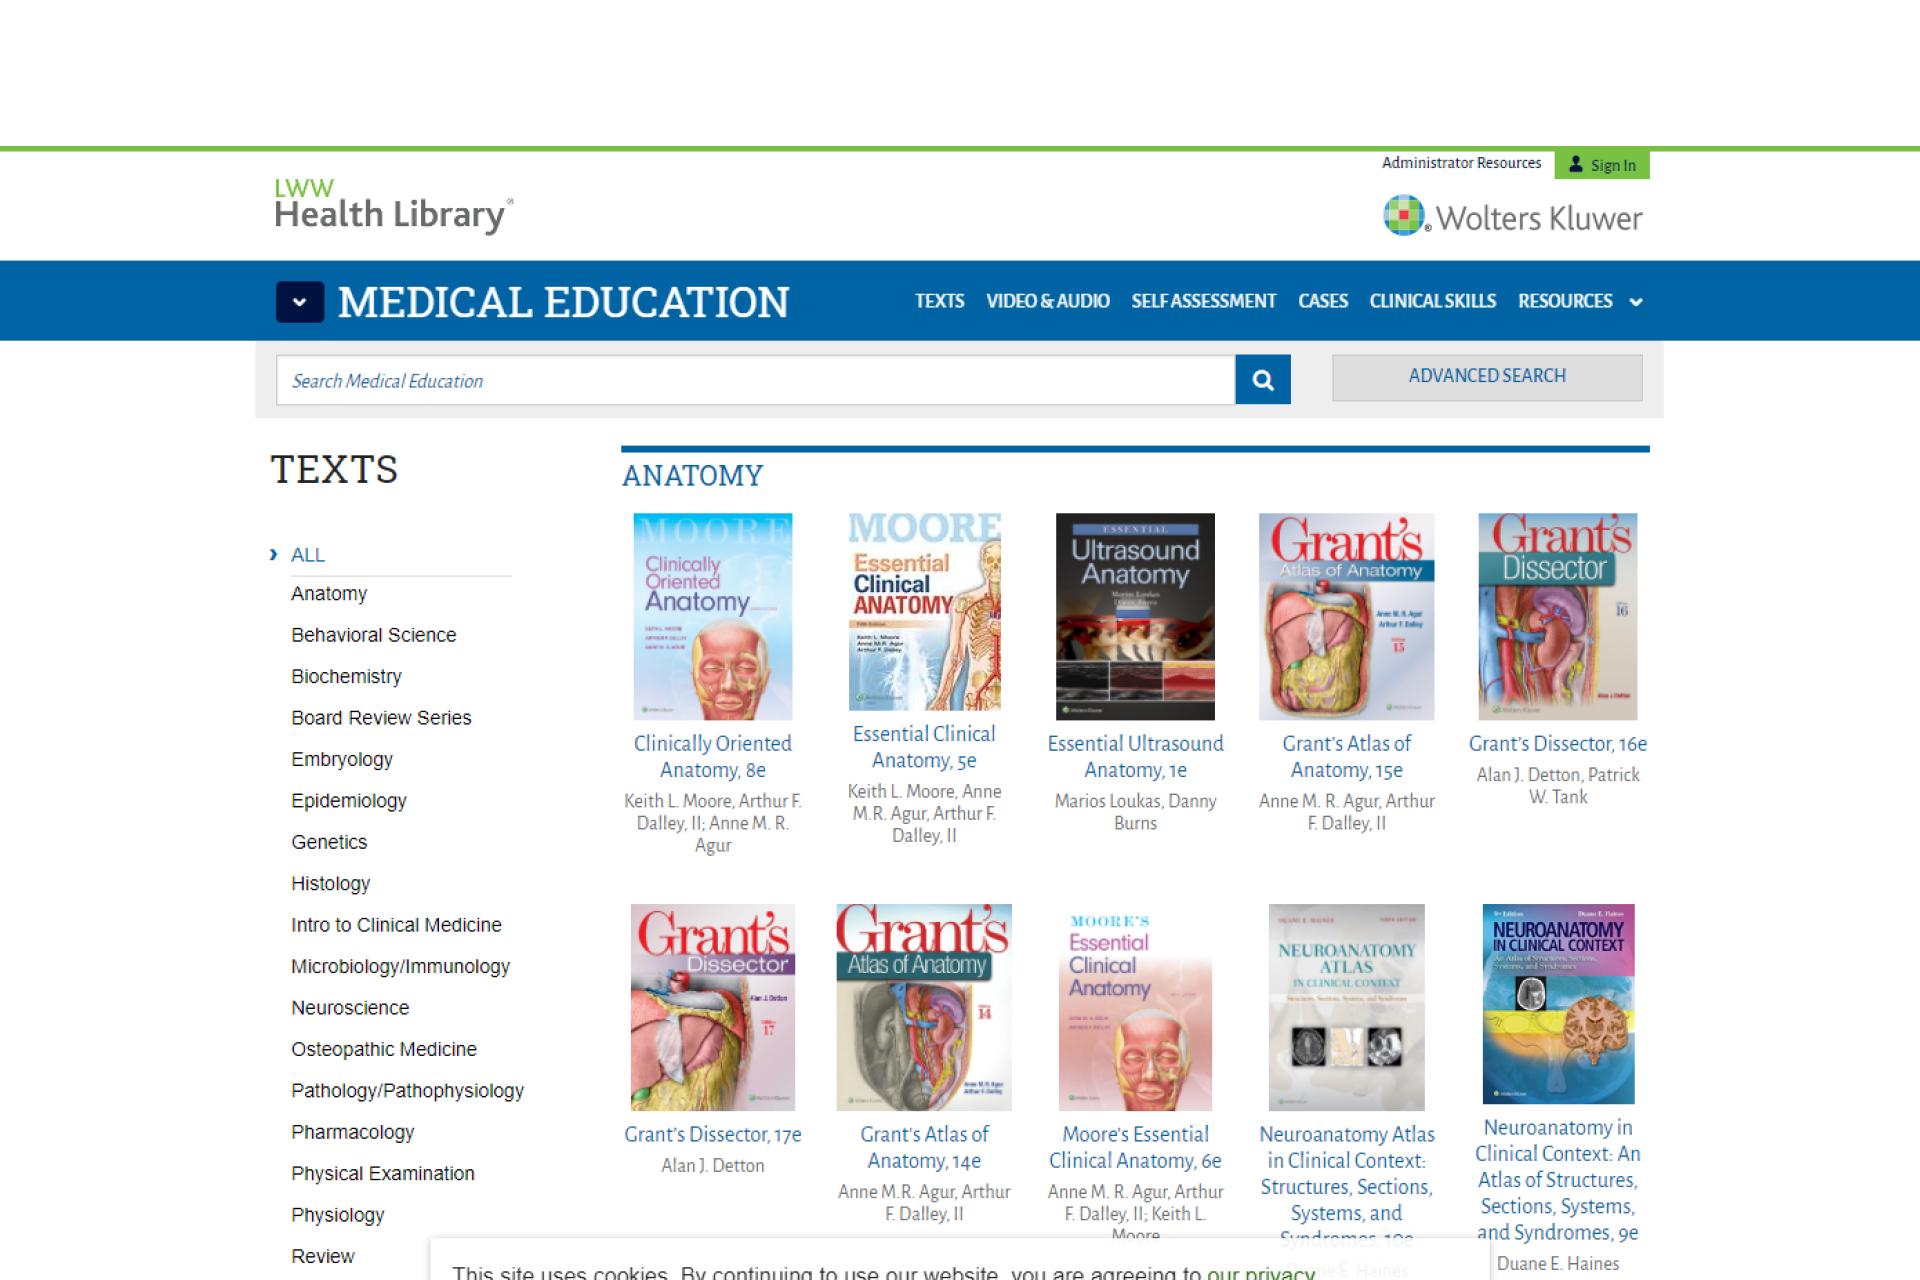 Screenshot of LWW Health Library website